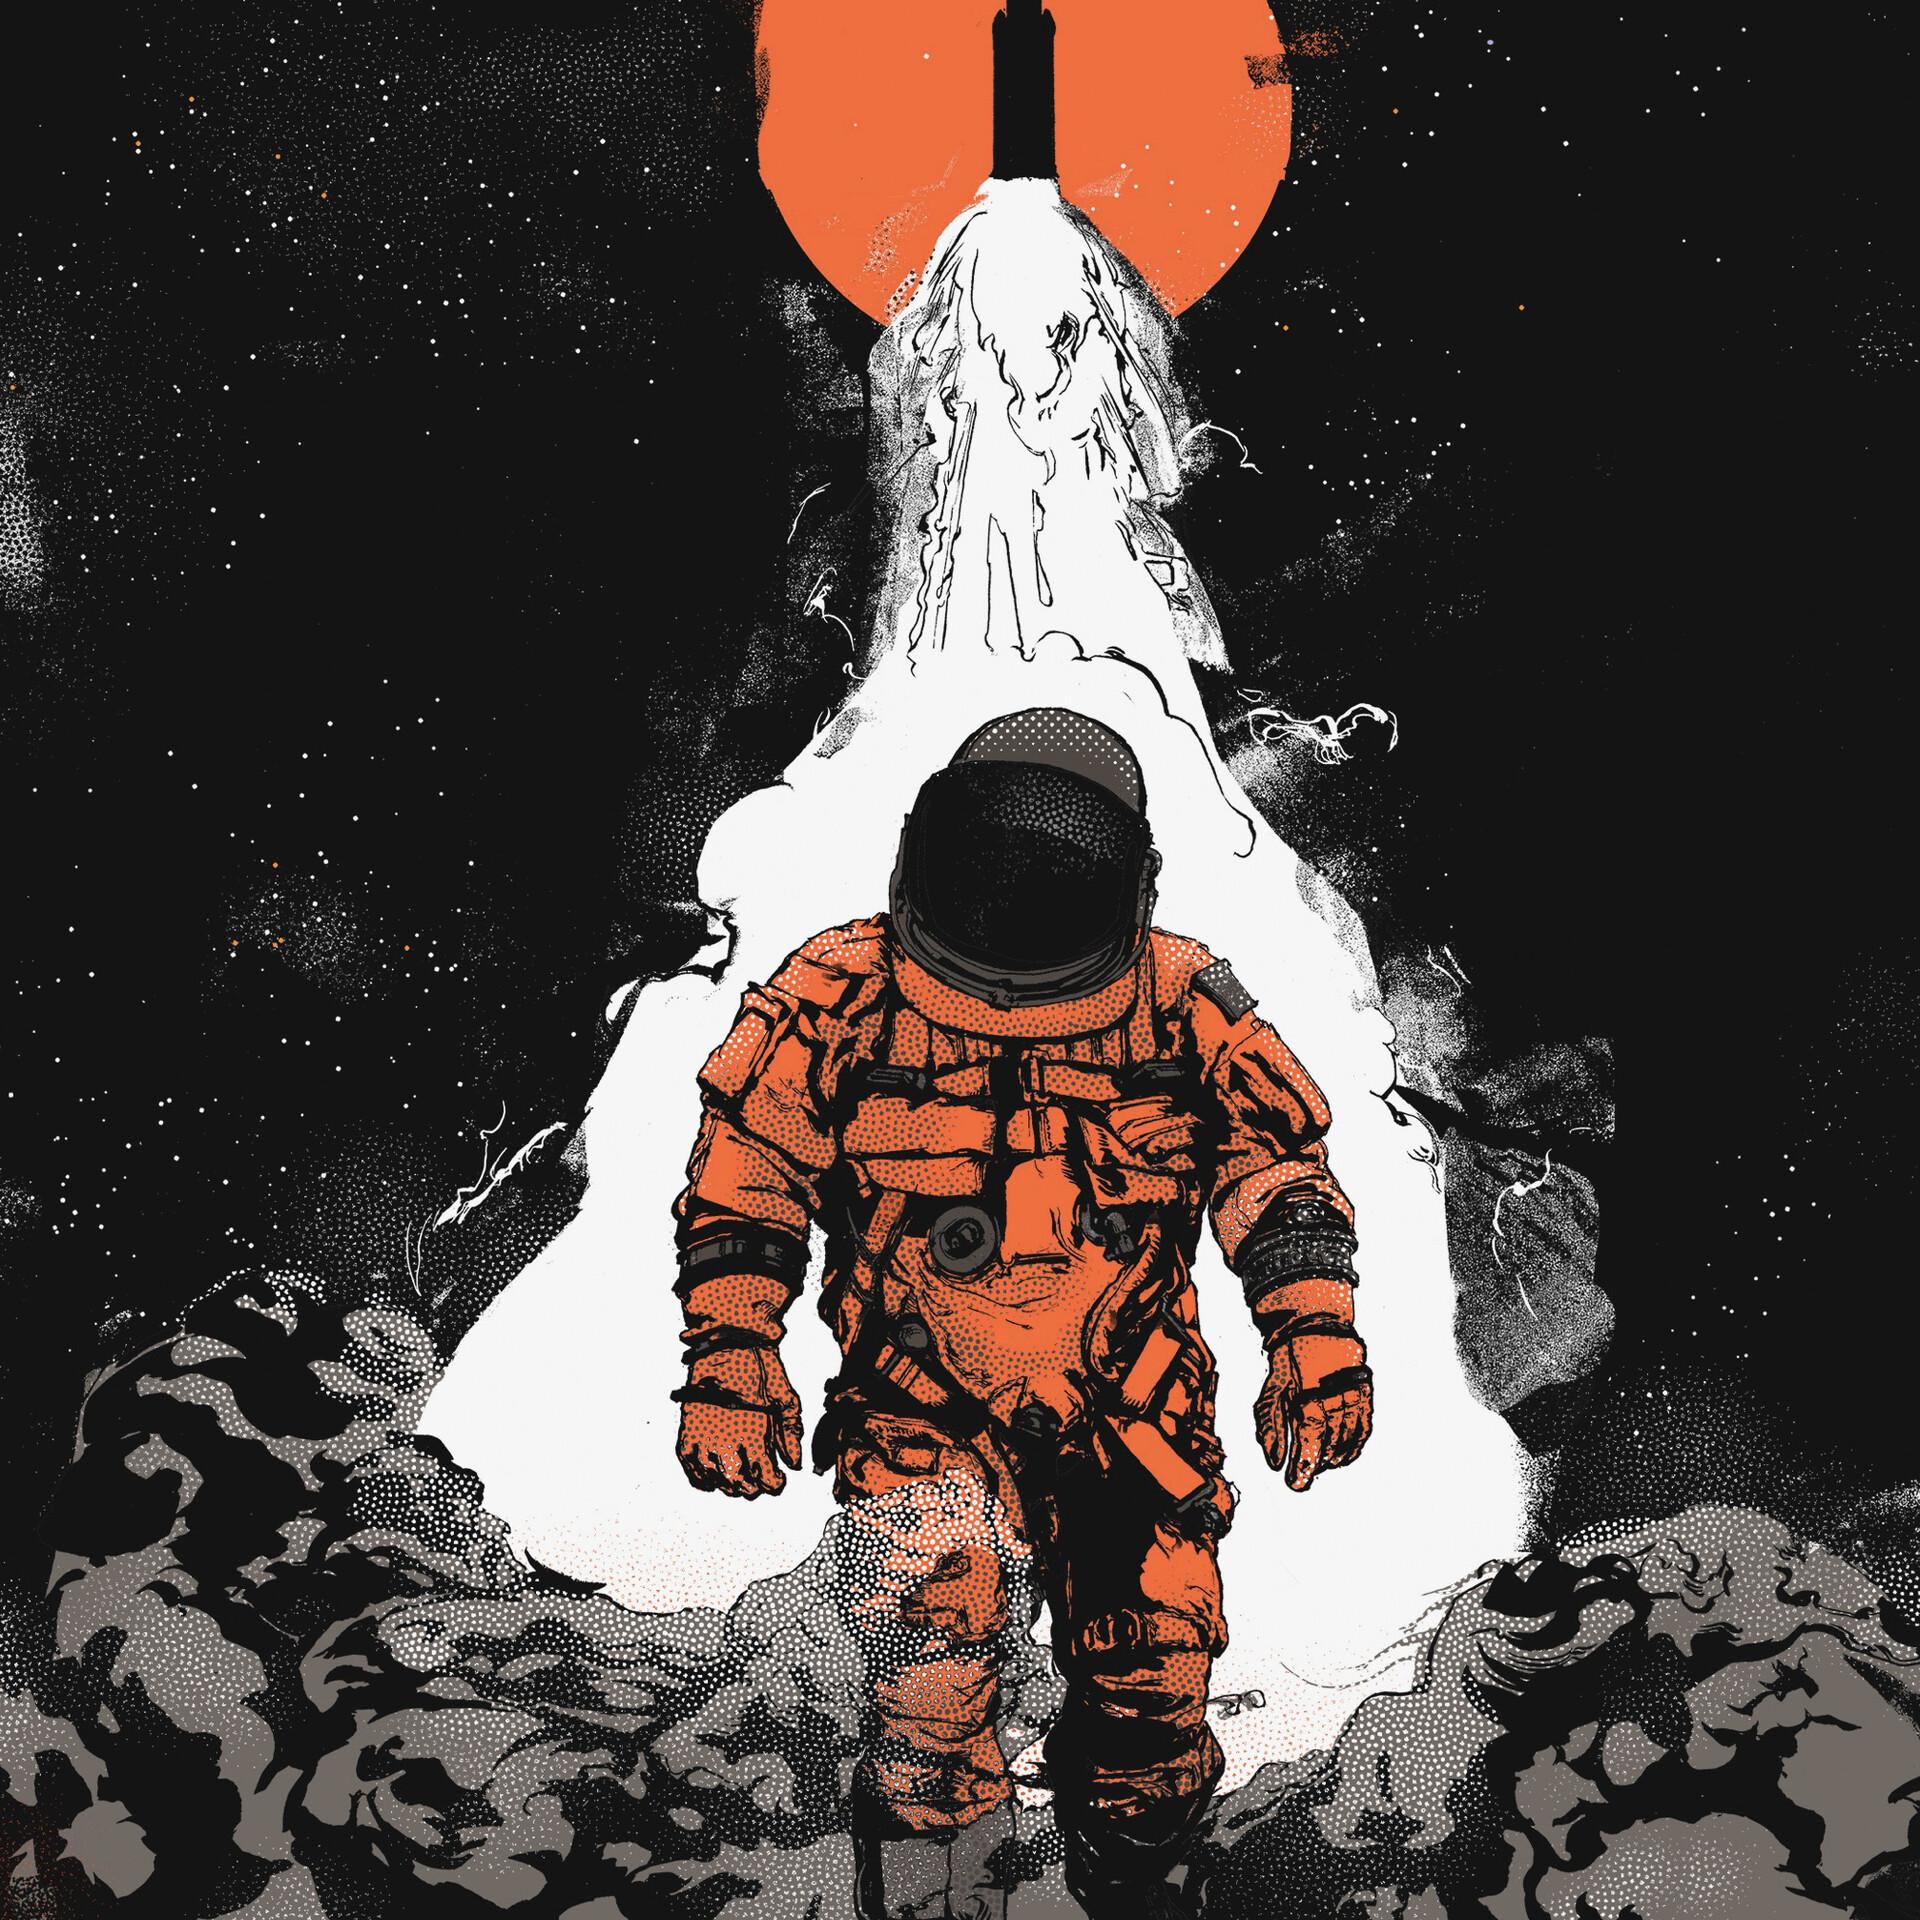 Moon to Mars: Astronaut Close-Up